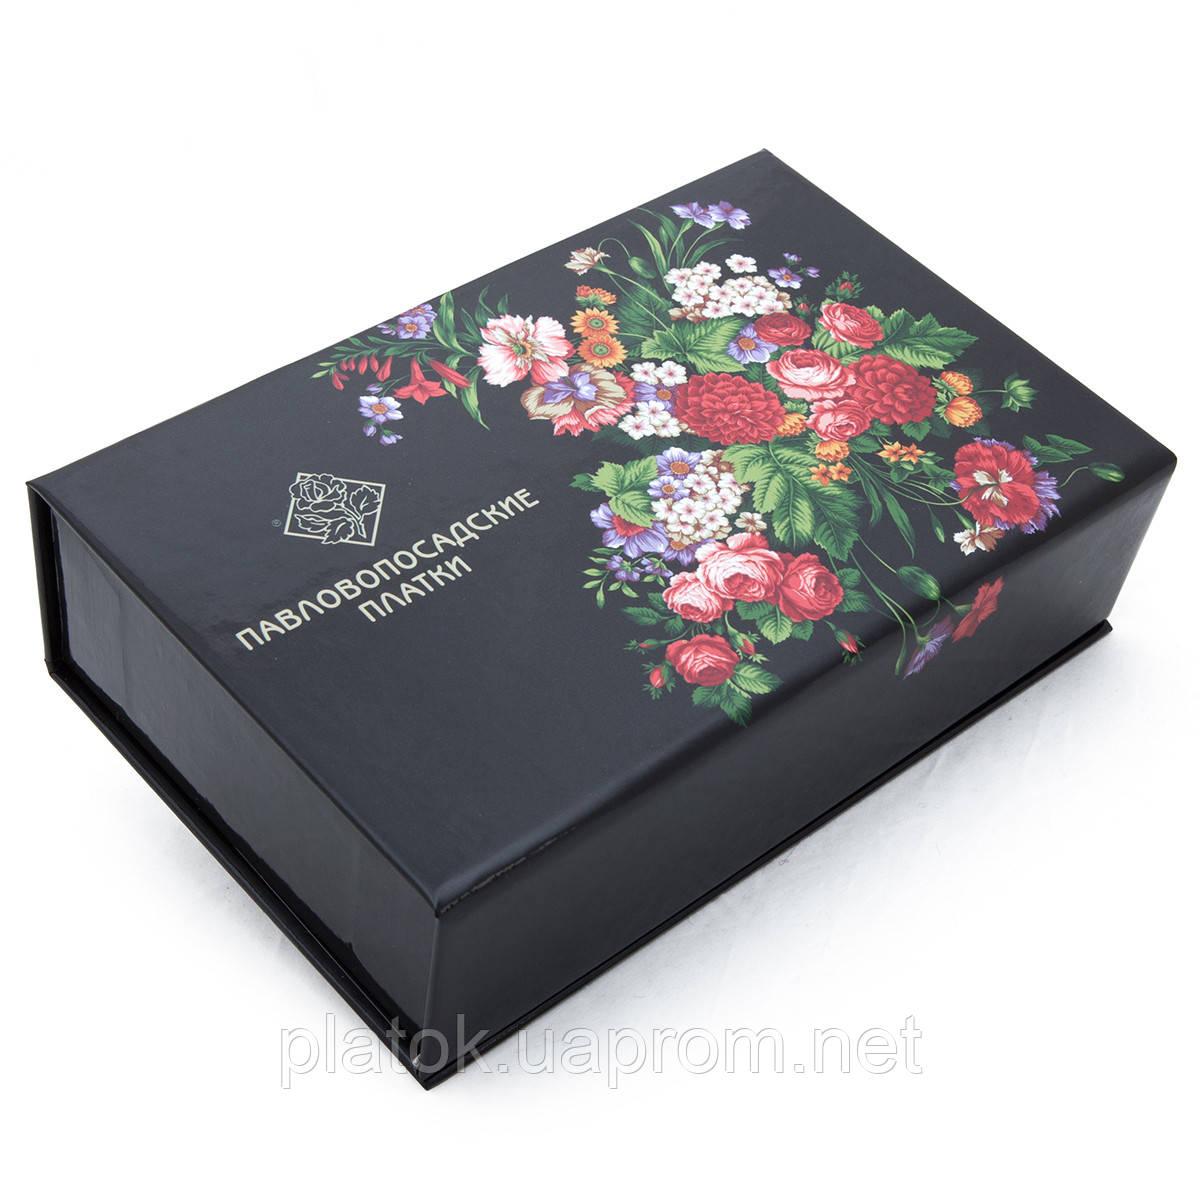 Подарочная коробка малая 160x100x40 мм